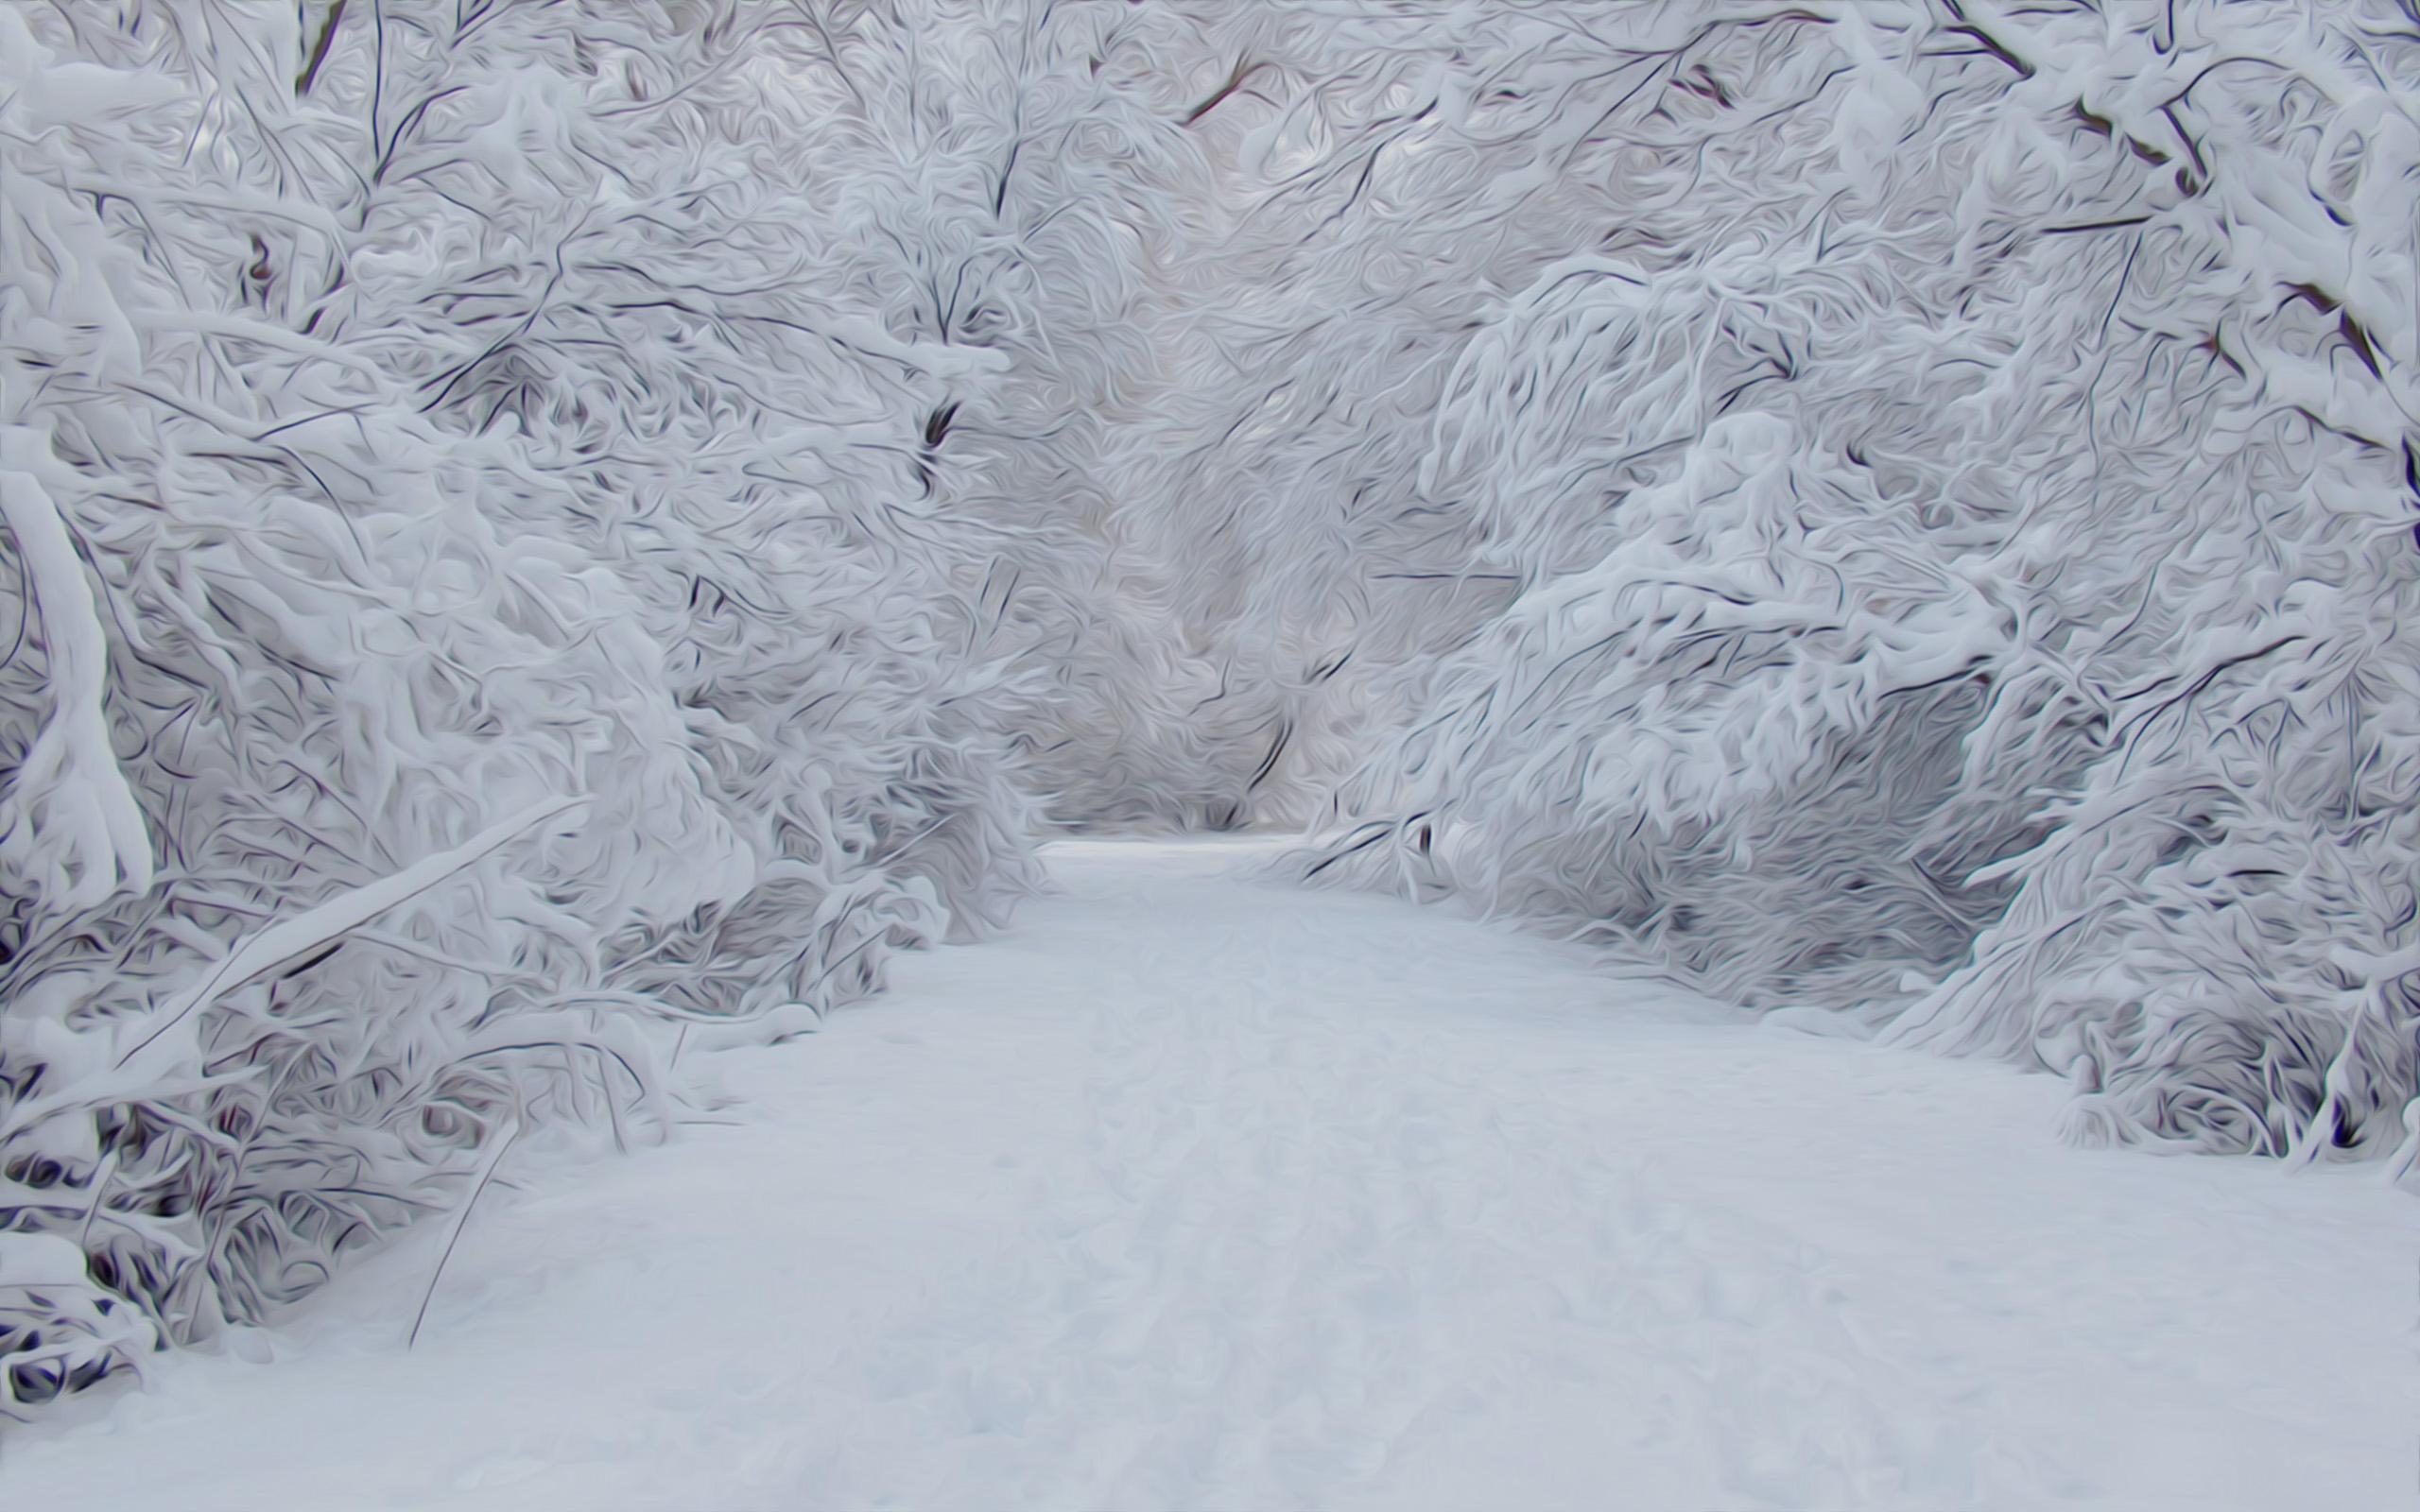 snowy snow   Winter Photo 34209346 2560x1600